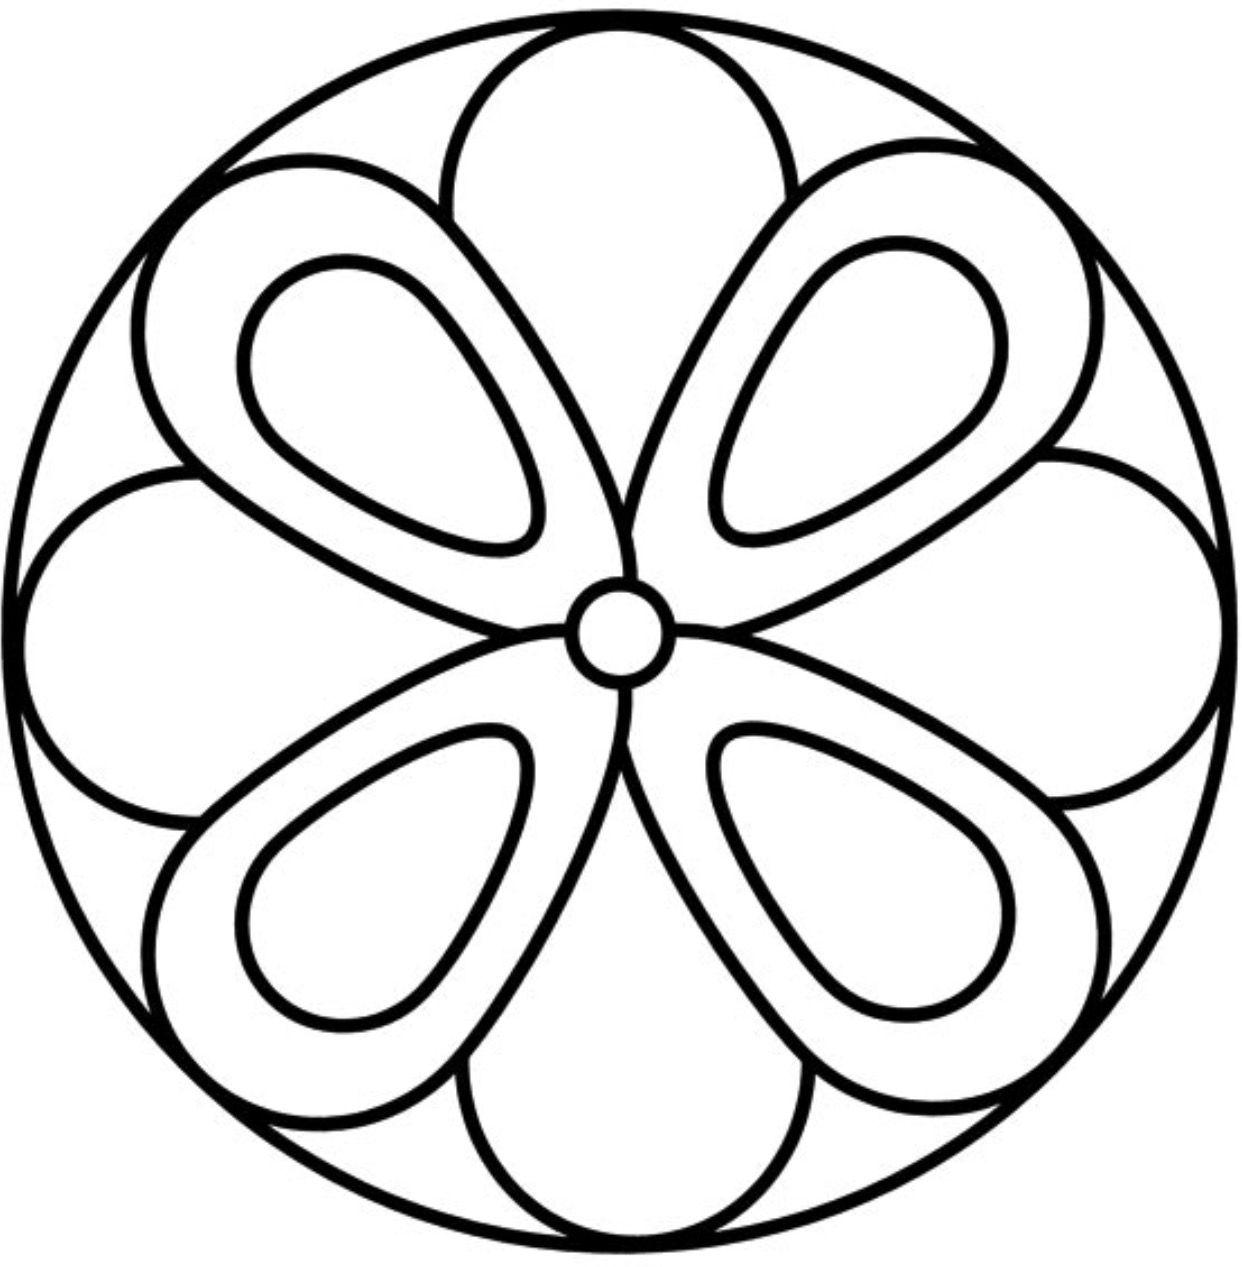 Pin by gila on mandalas   Pinterest   Celtic patterns and Patterns